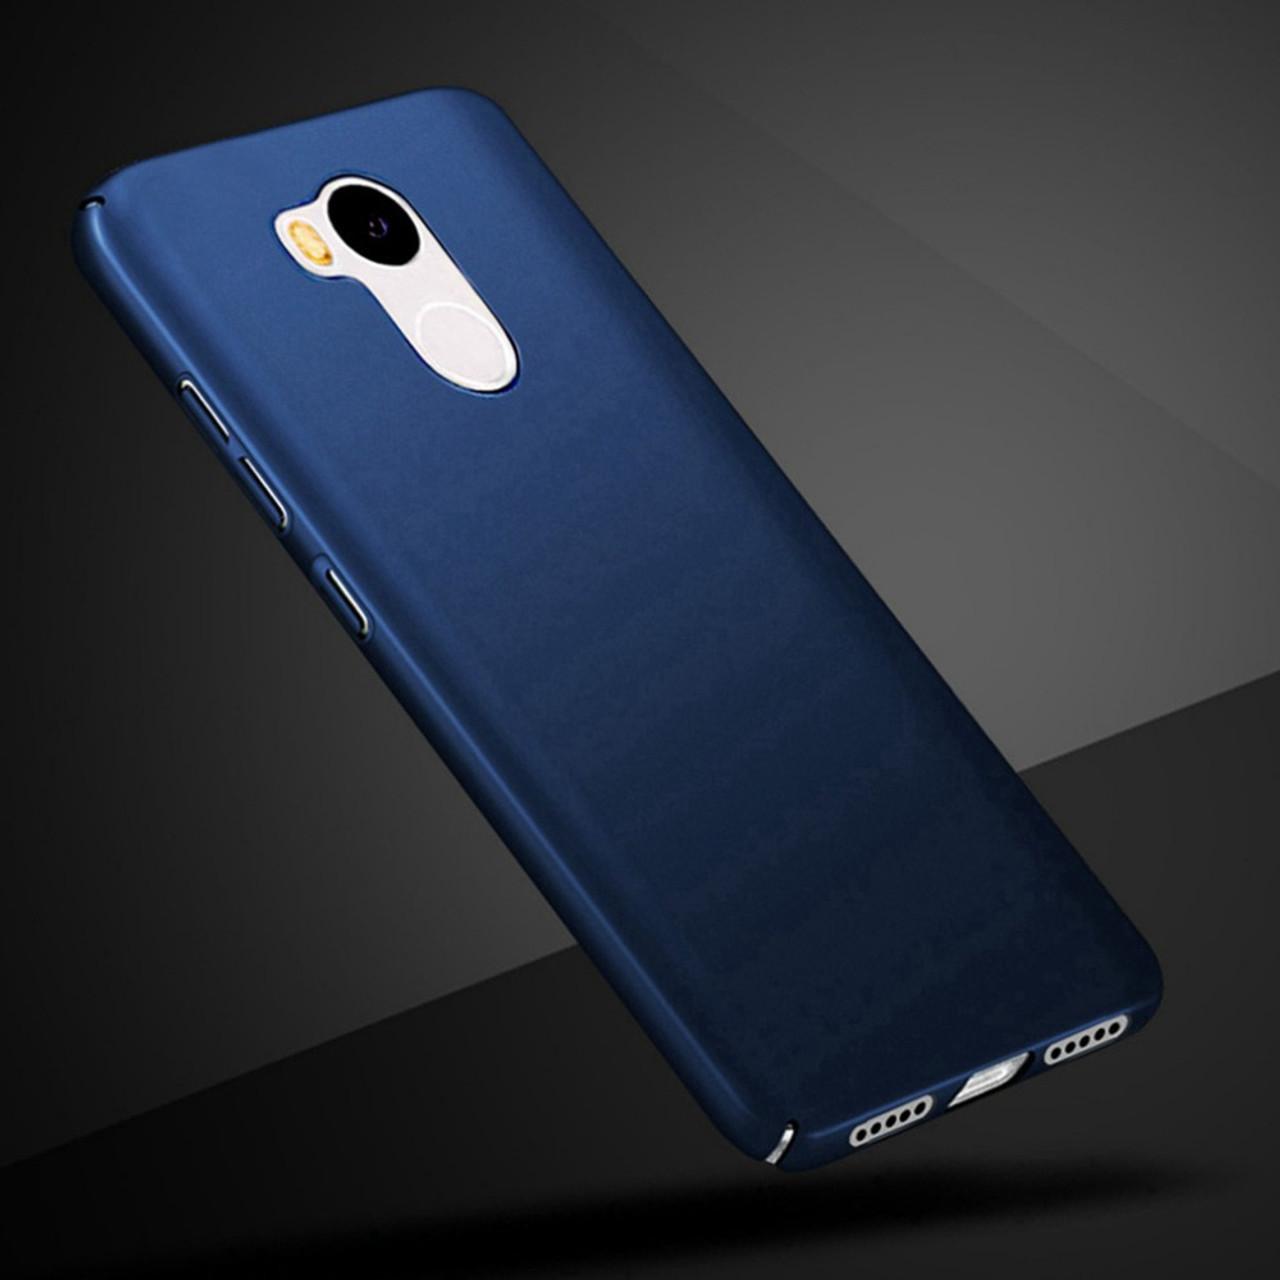 pretty nice 56346 458af Luxury Design Case For Original Xiaomi Redmi 4 Pro Prime 32GB 360 Fulls  Plain Hard Back Cover Case For Xiaomi Redmi 4 Pro Prime